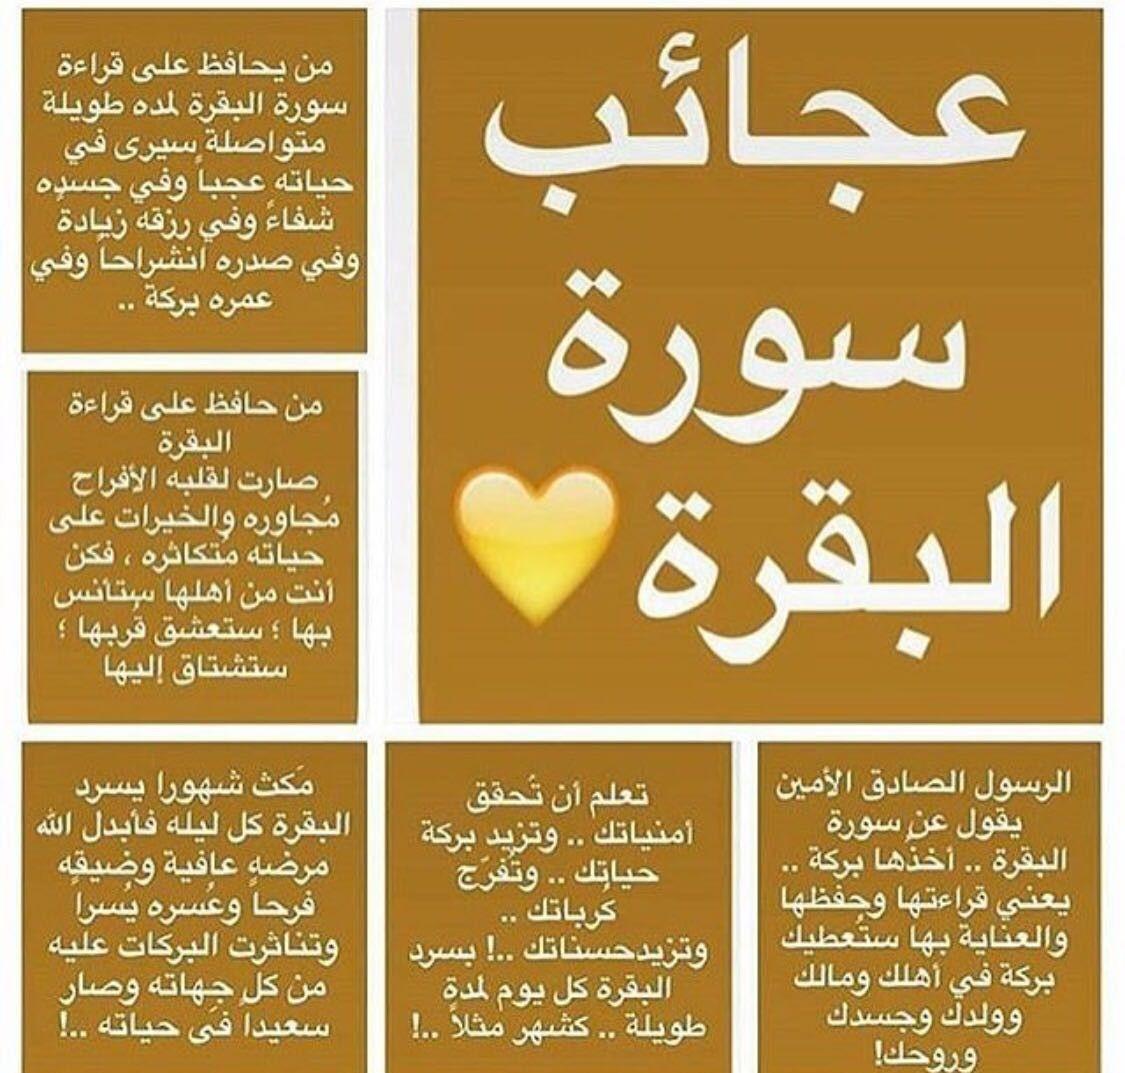 Pin By Lateefa Modo Unico On إيمانيات Islam Facts Islam Beliefs Islamic Quotes Quran